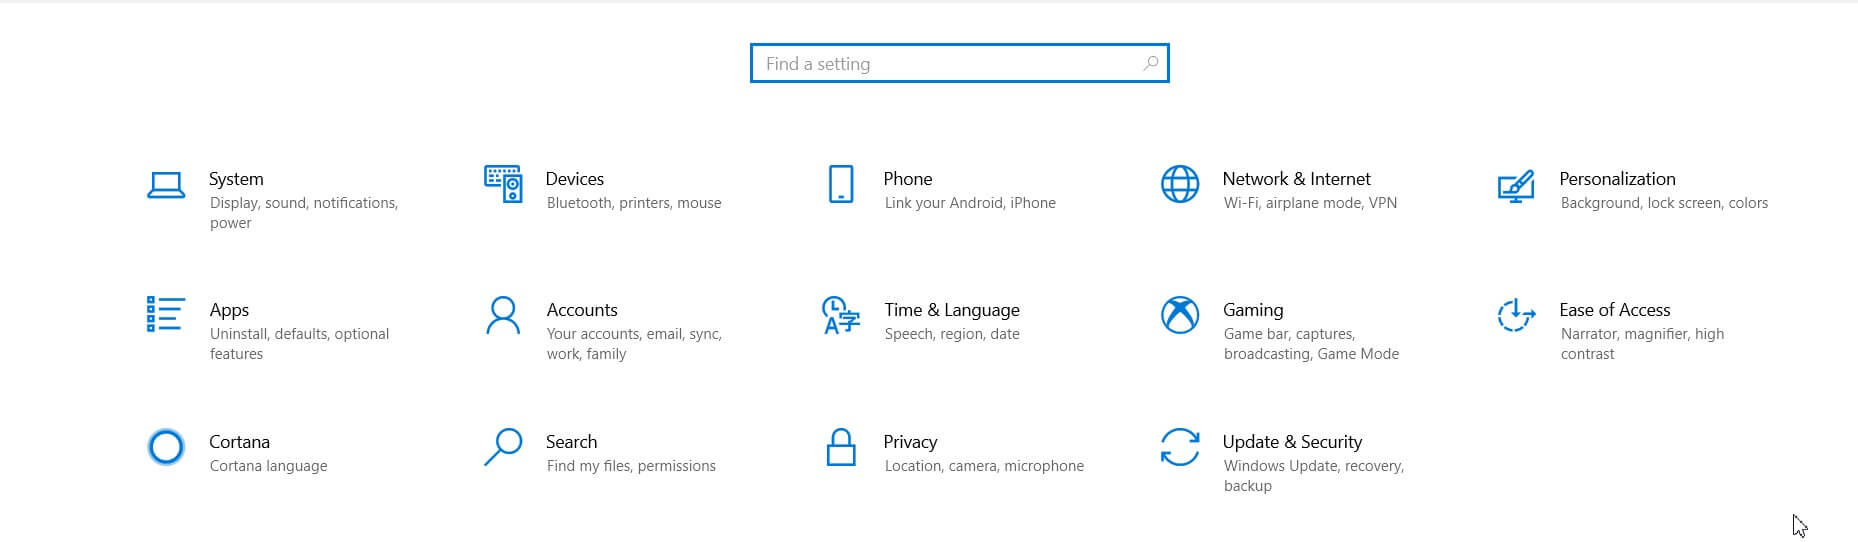 Uninstall Windows 10 and go back to Windows 7 or Windows 8.1 - Image 1